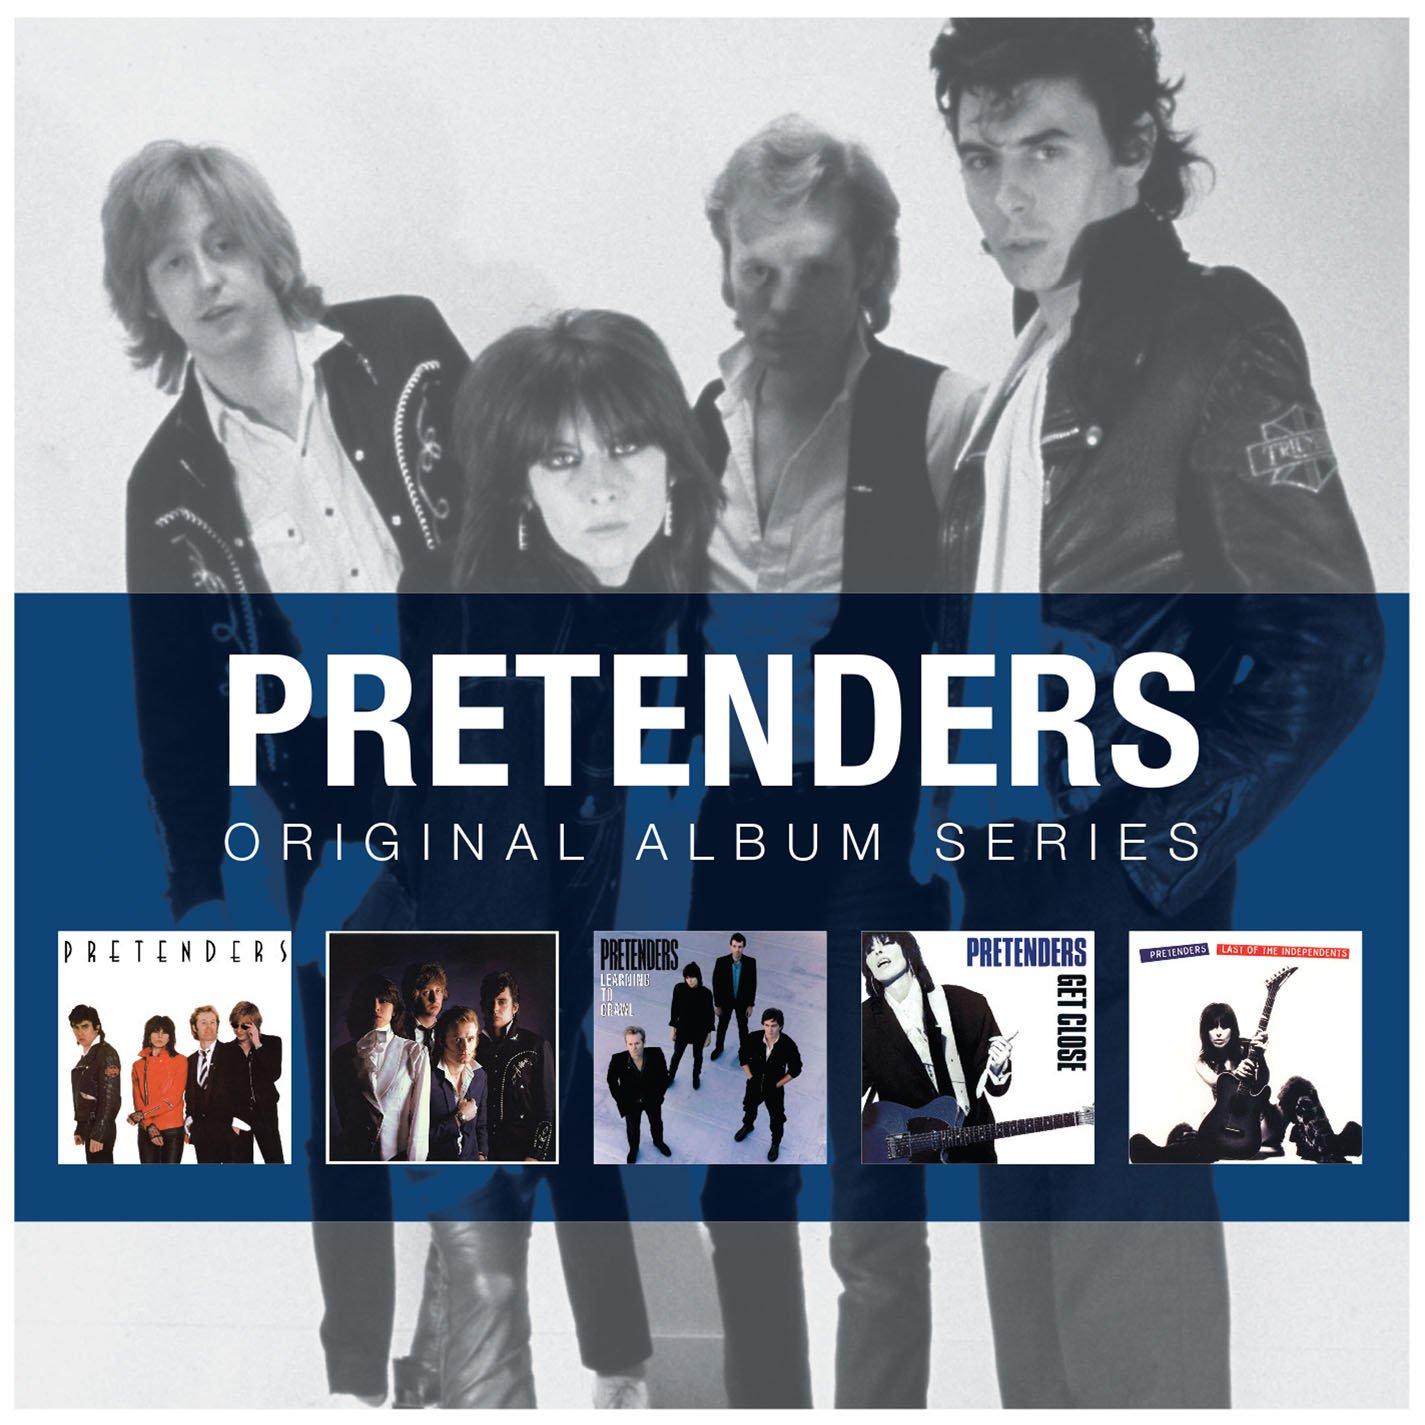 The Pretenders - Página 2 71H8otSQnqL._SL1425_